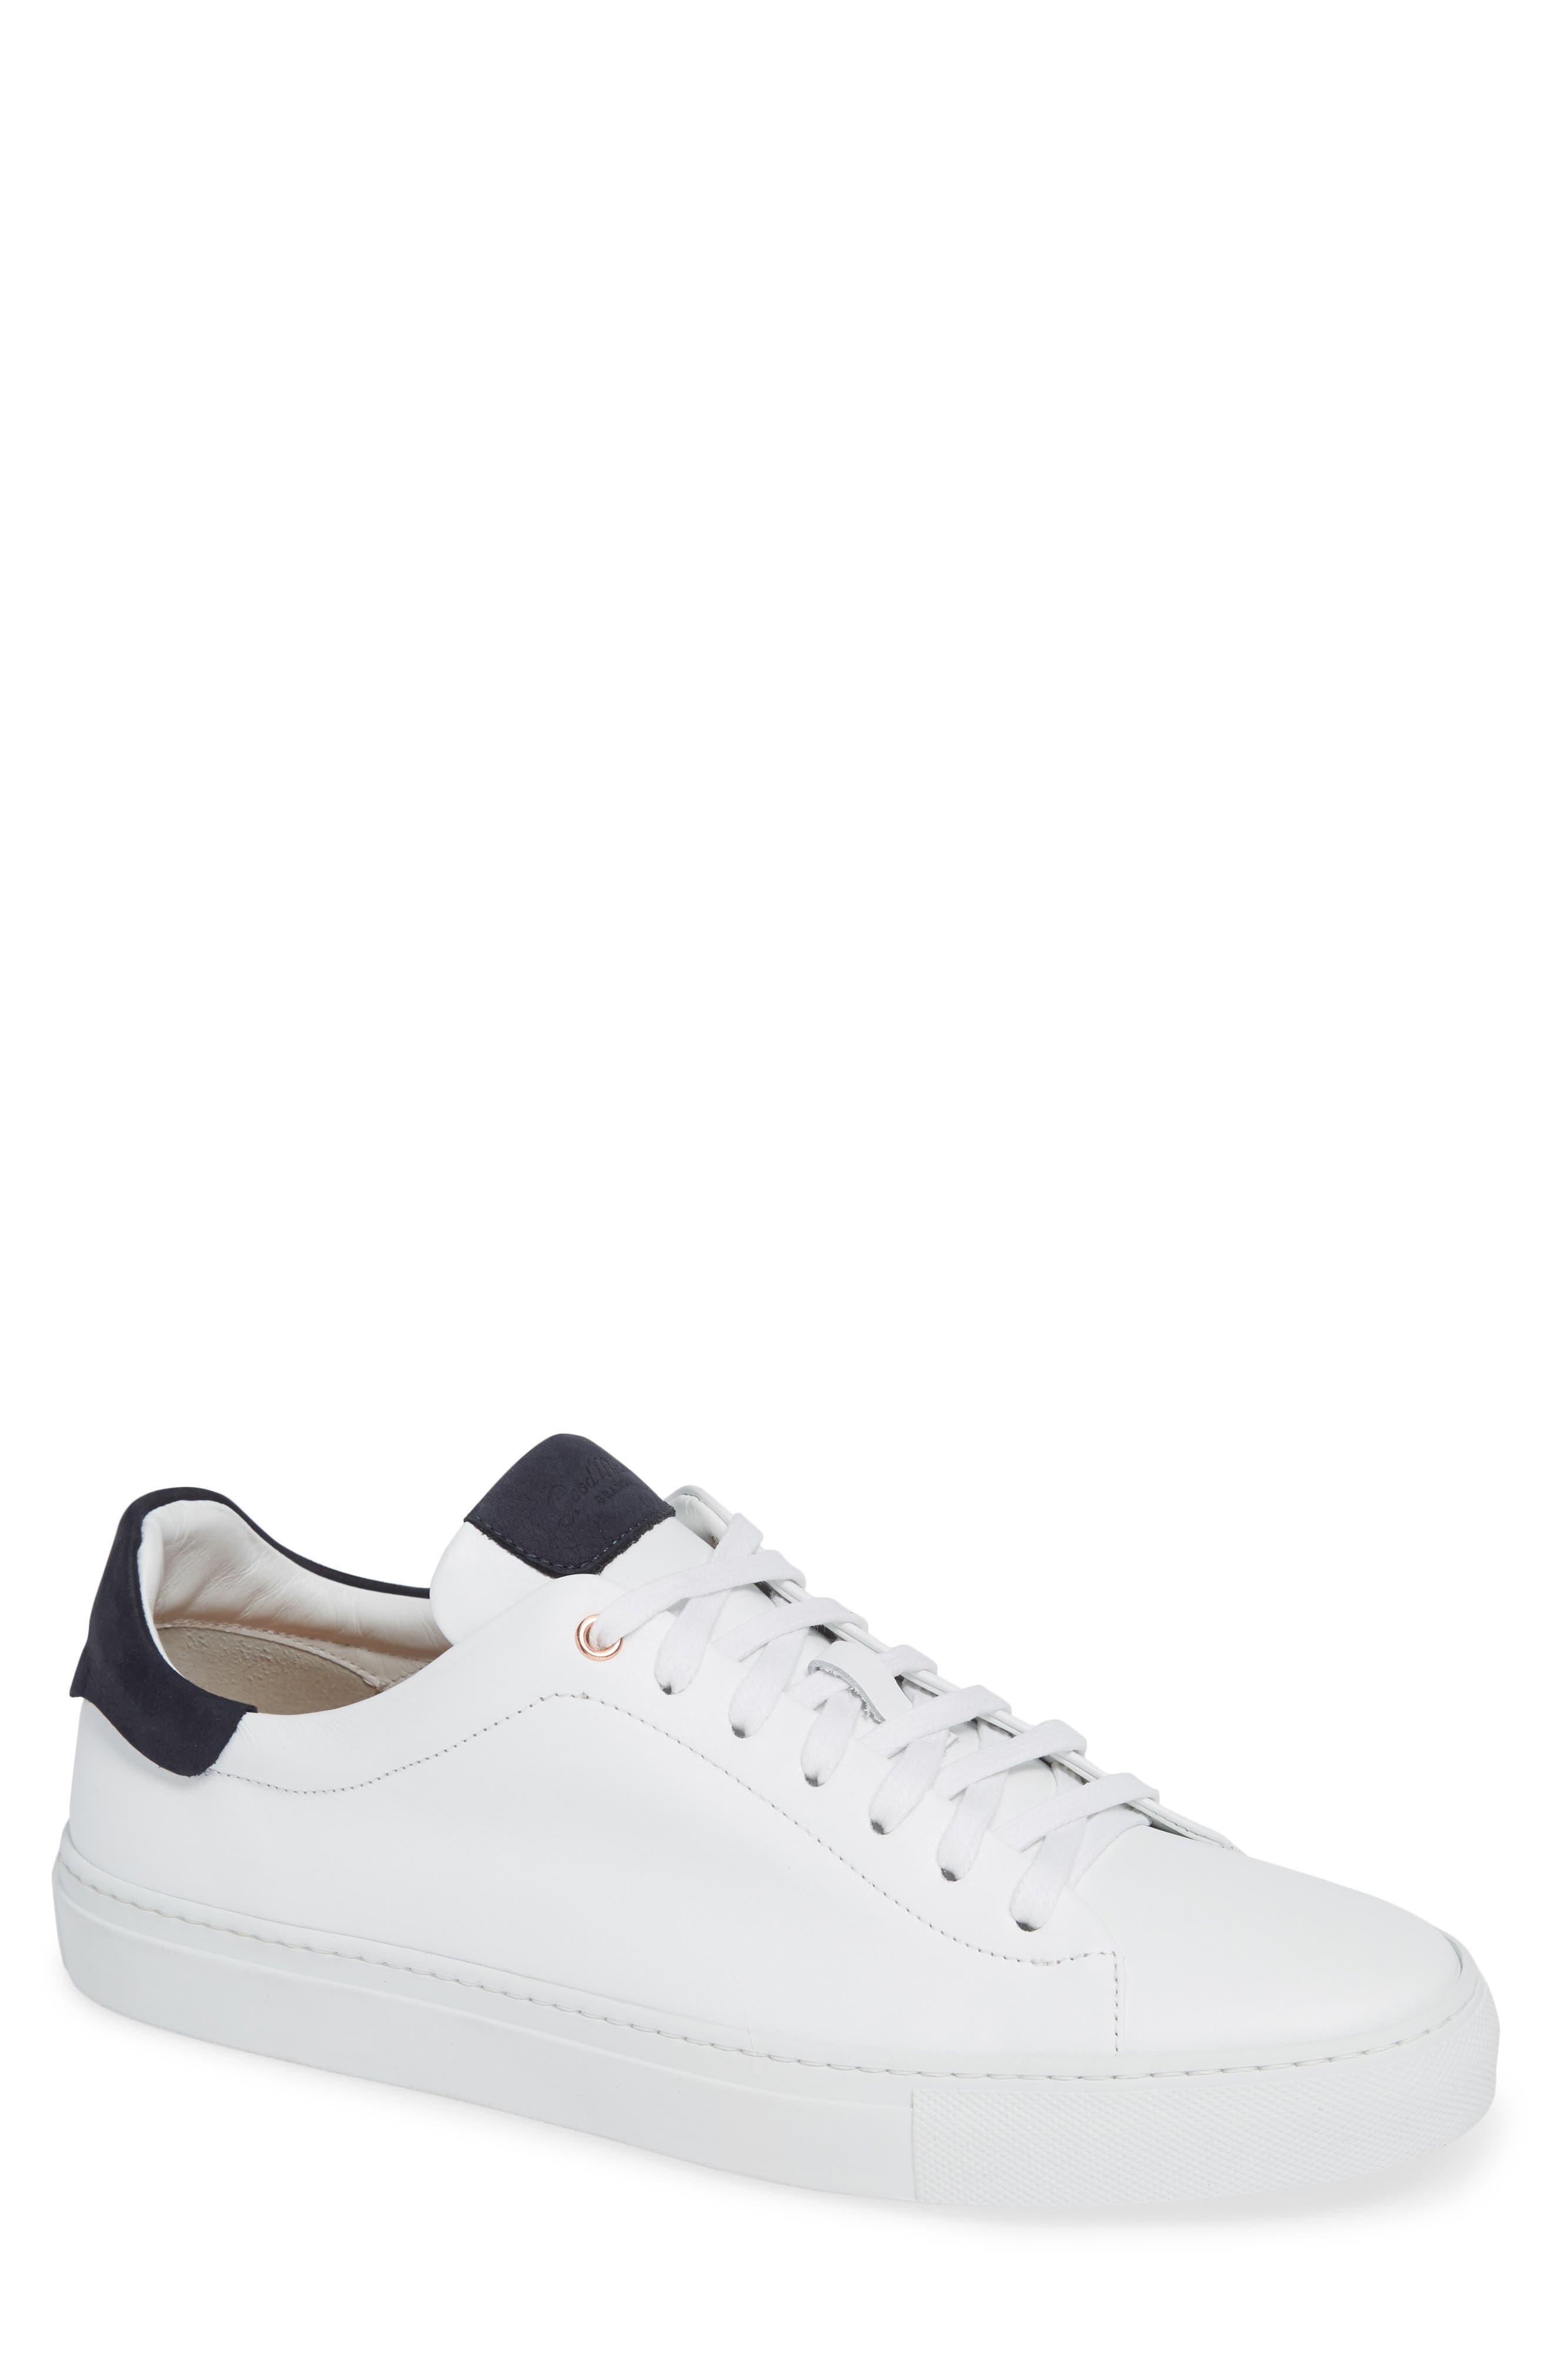 Legend Low Top Sneaker,                         Main,                         color, 113